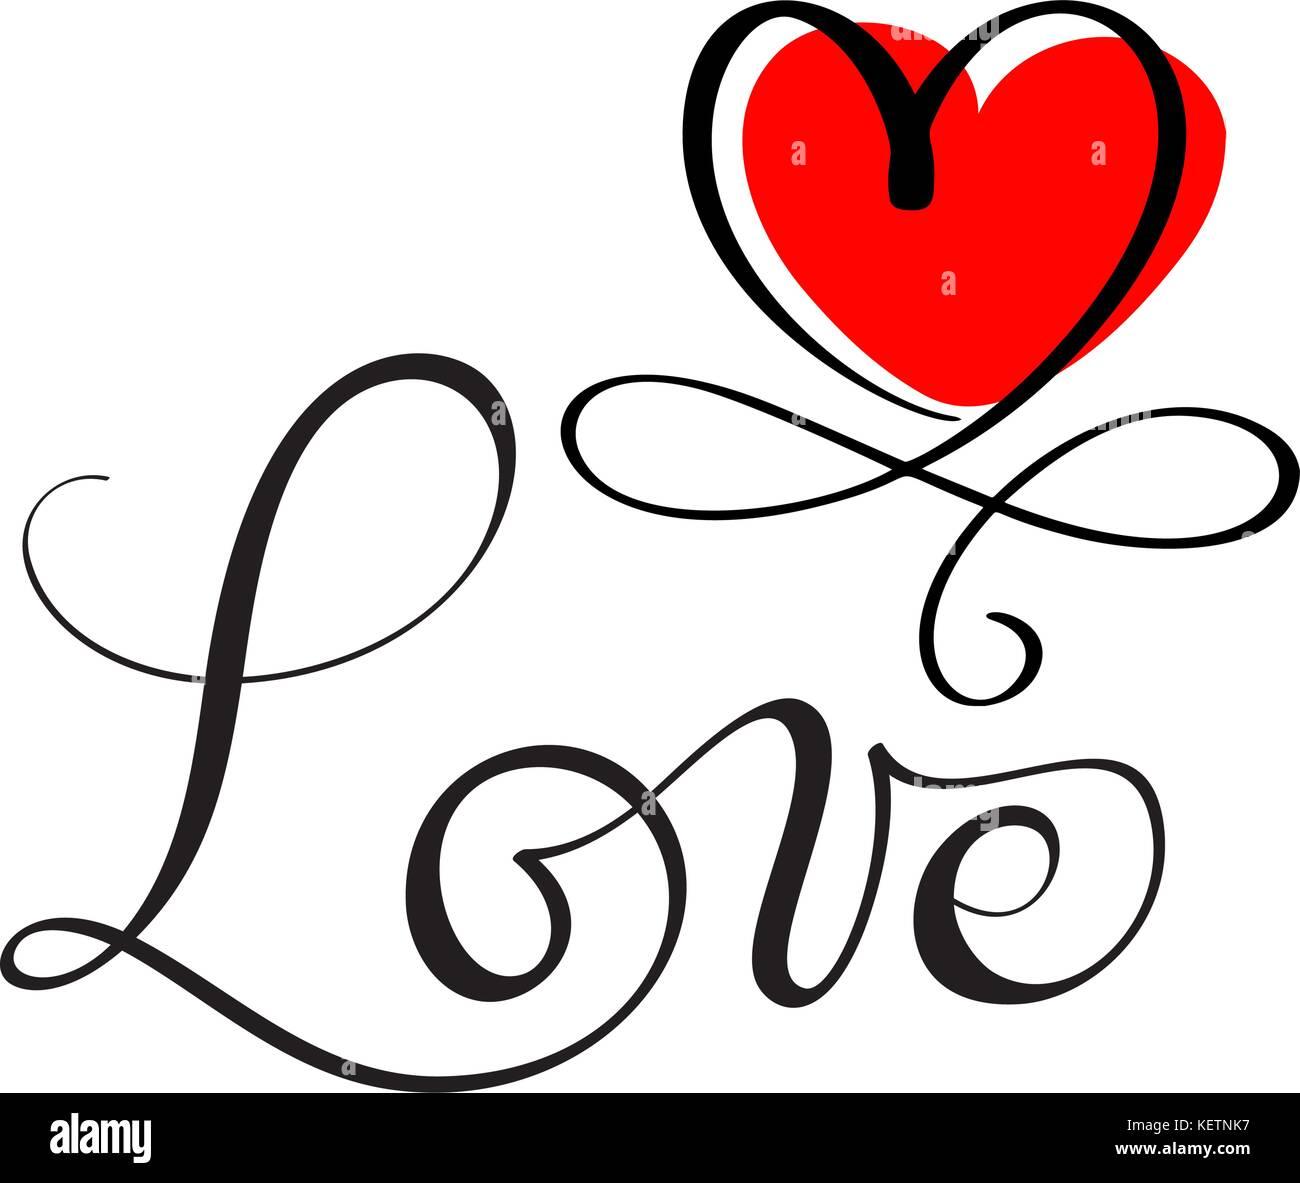 LOVE original custom hand lettering, handmade calligraphy, design element of the red heart flourish - Stock Image